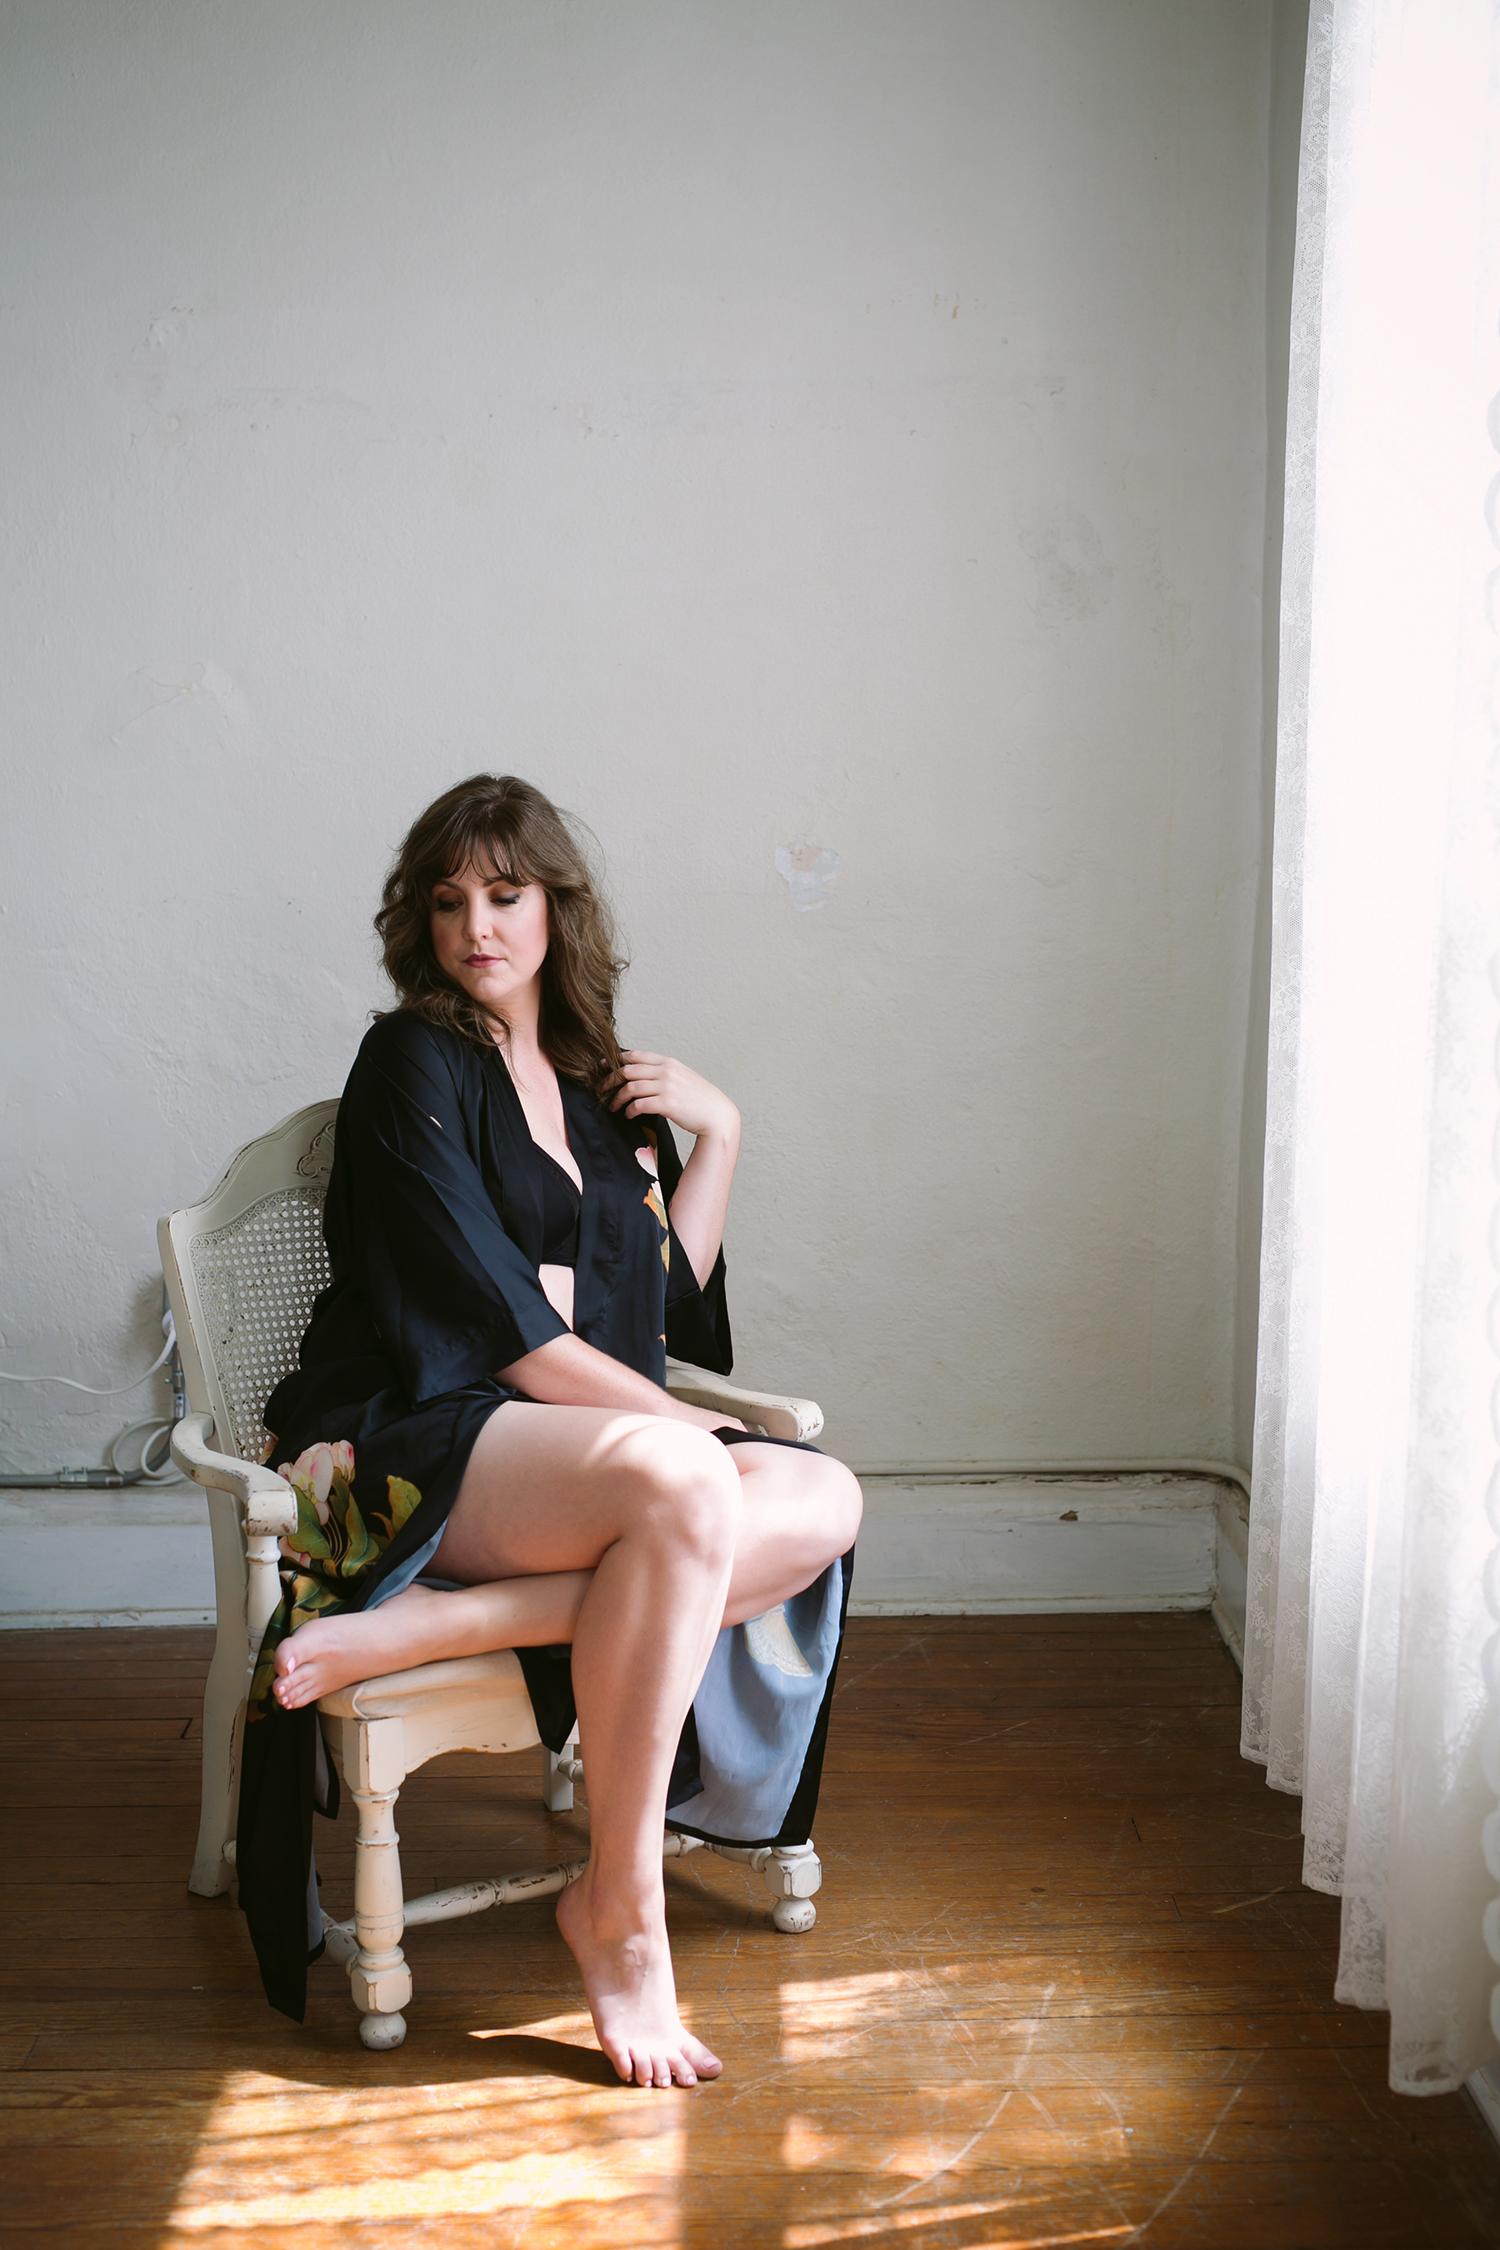 austin-texas-classy-boudoir-photography-KBB02.jpg